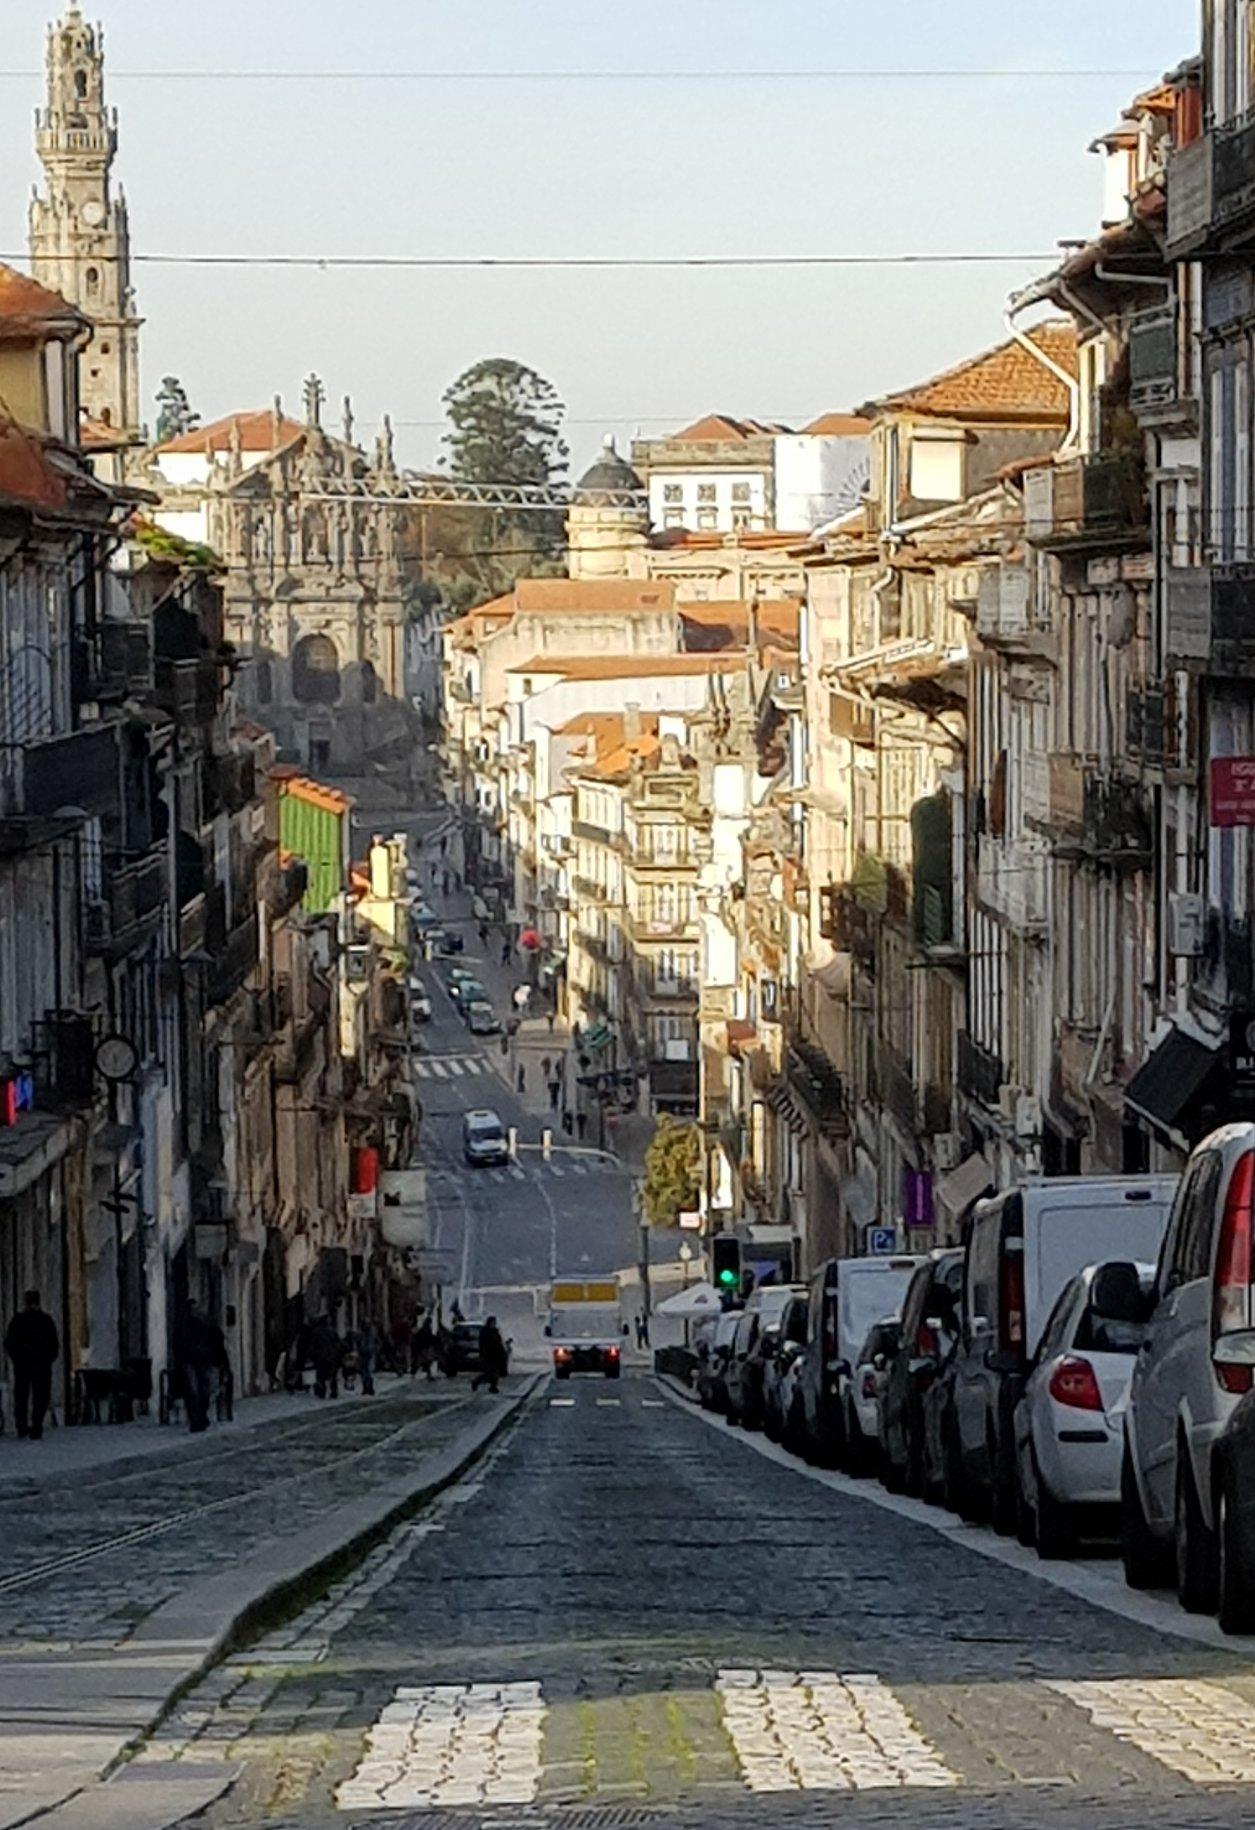 The steep Porto streets